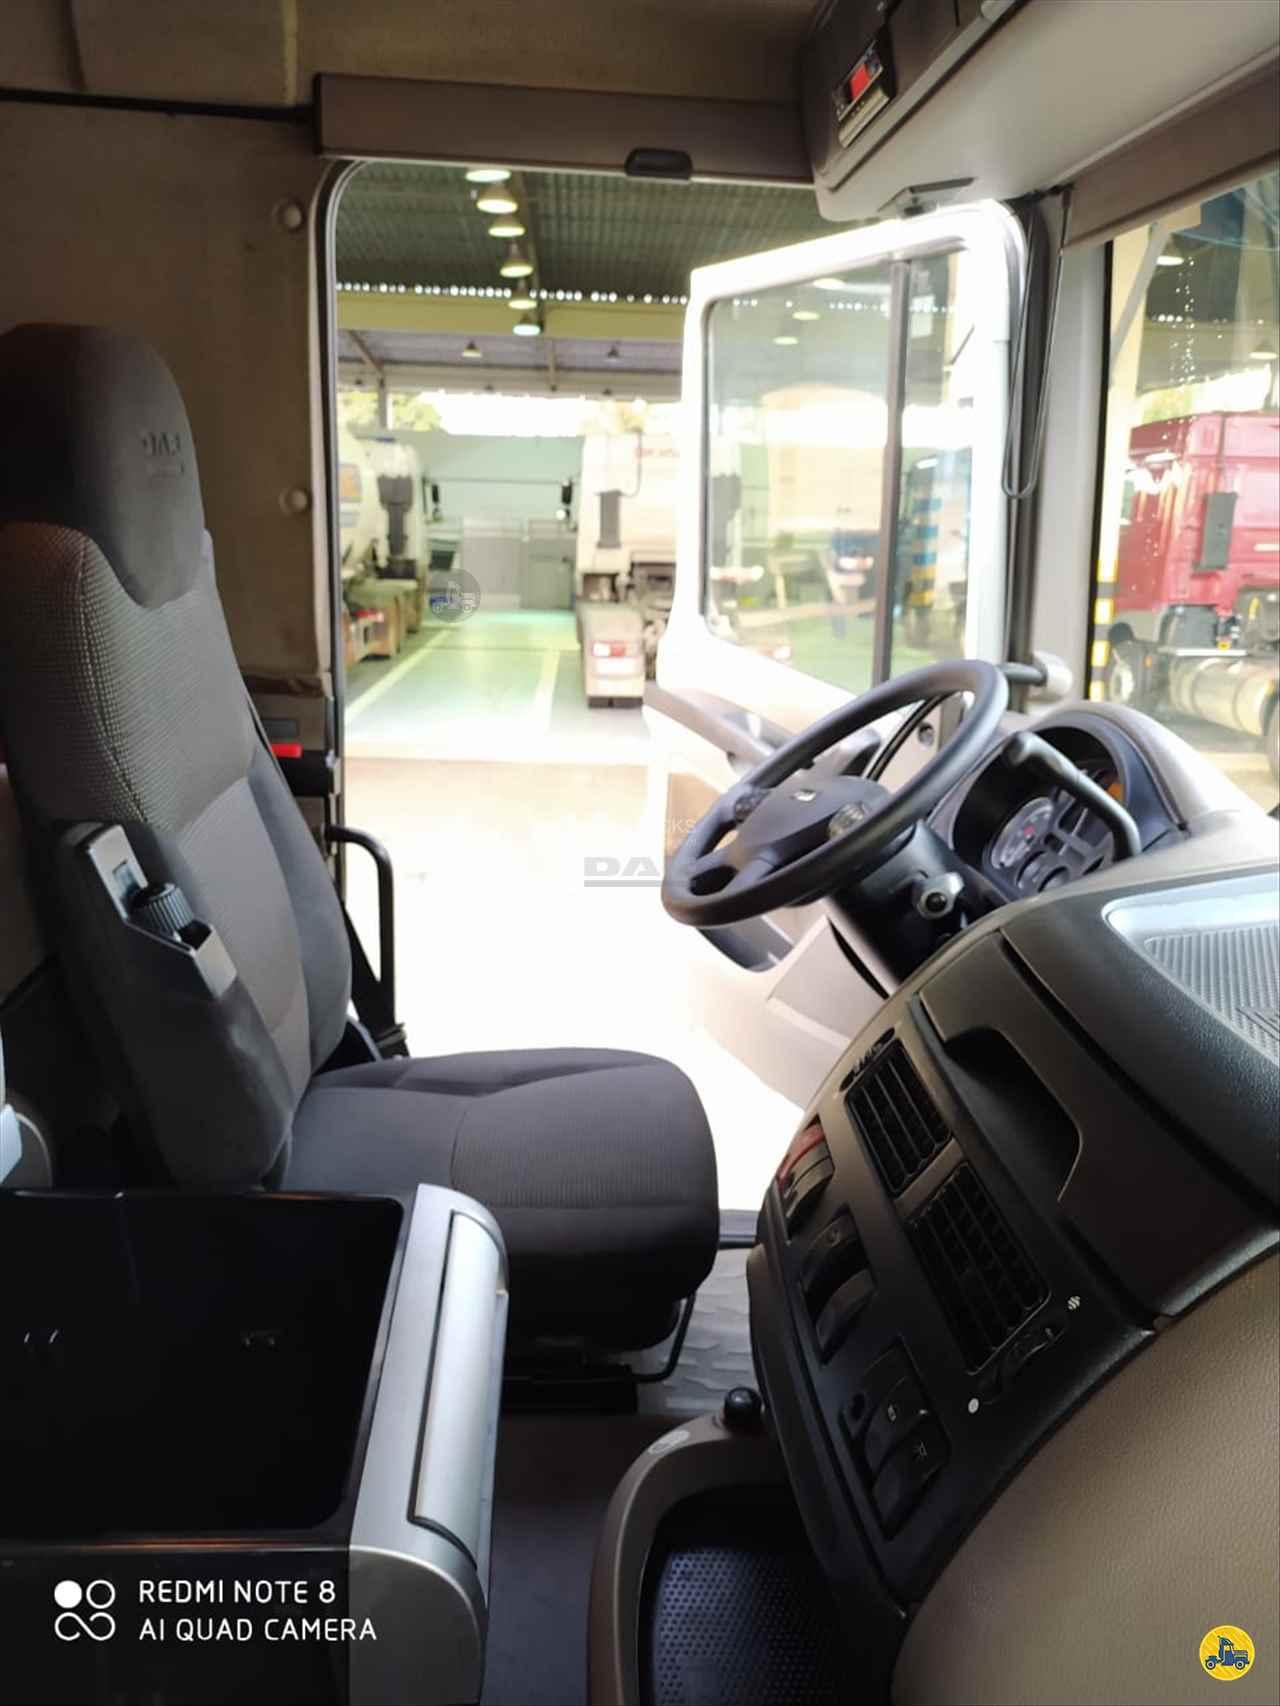 DAF DAF XF105 460 454569km 2014/2014 Via Trucks - DAF